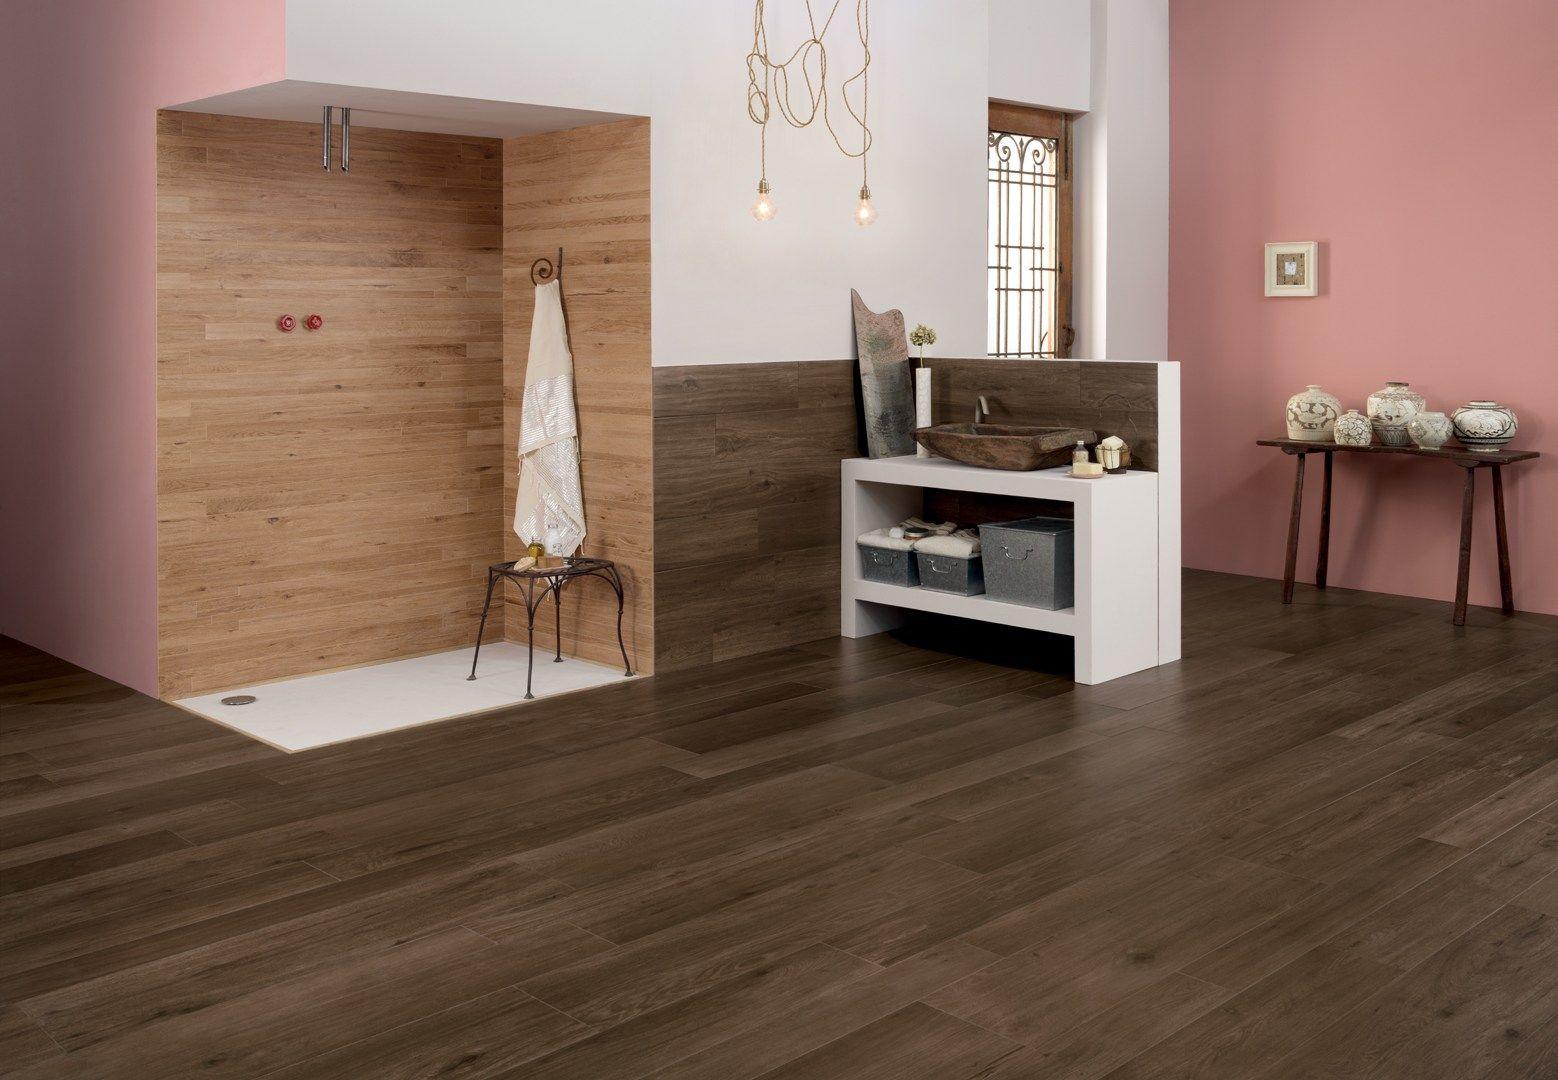 Pavimento rivestimento ecologico ingelivo effetto legno - Losas imitacion madera ...